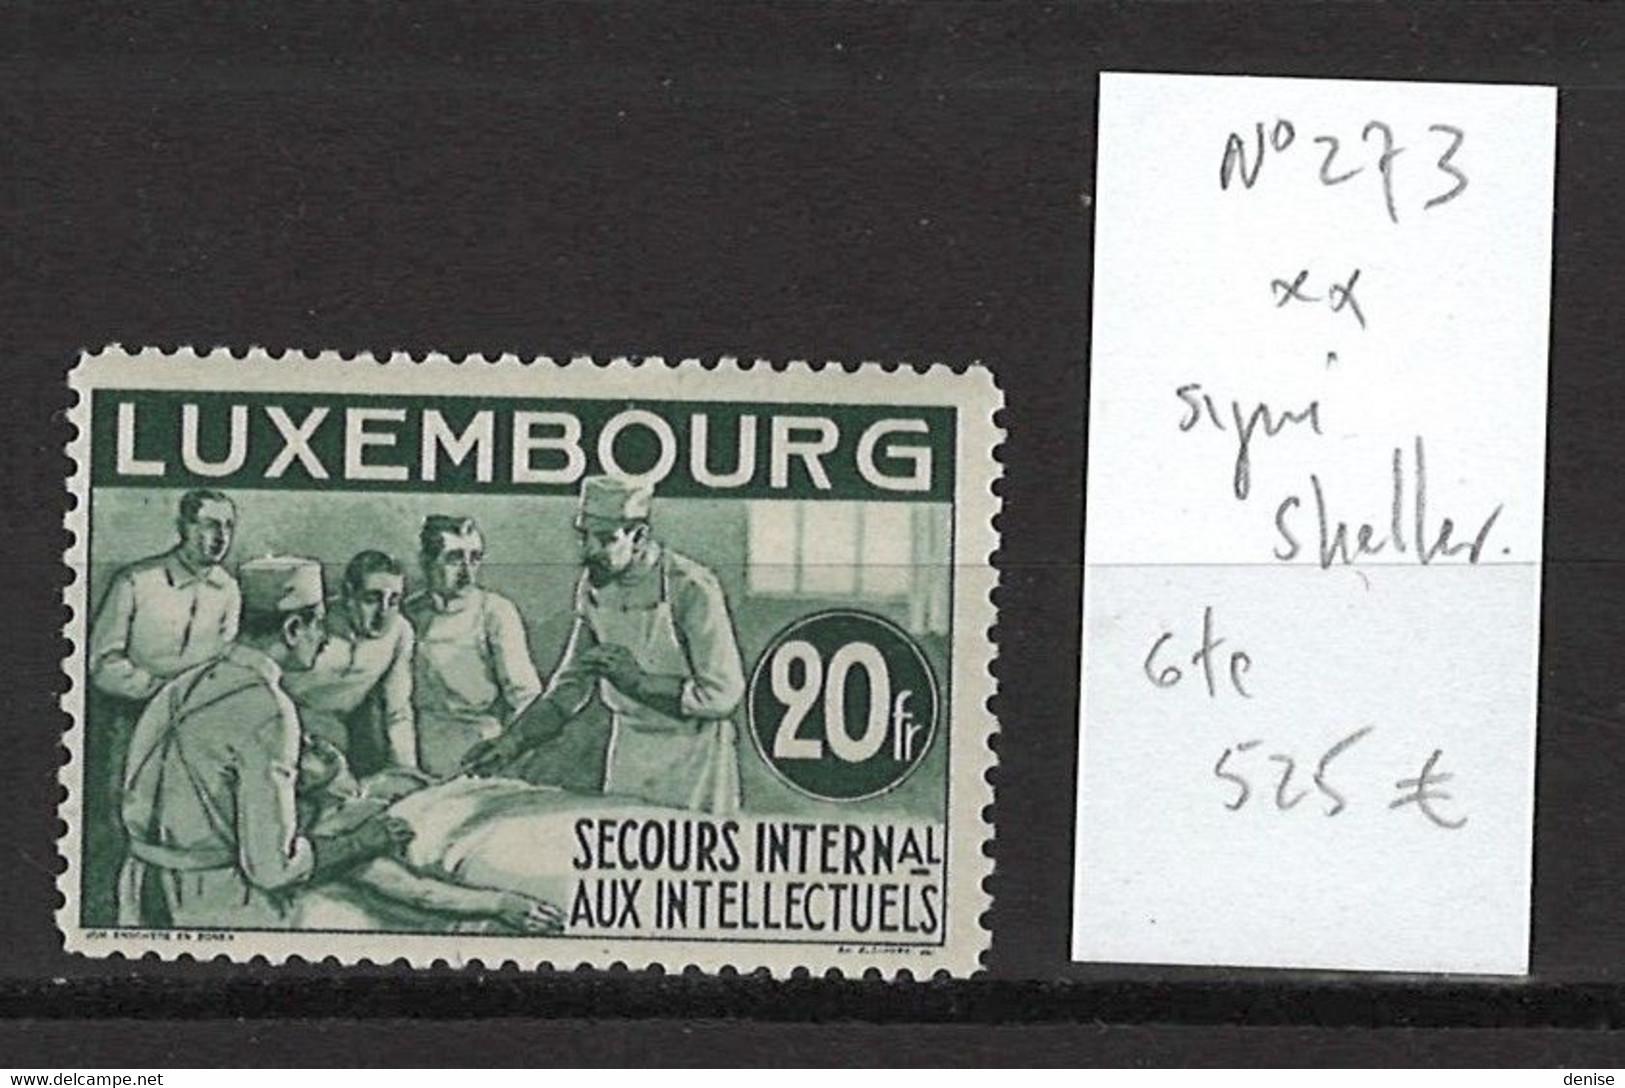 Luxembourg - Yvert 273** - 20frs Secours Intellectuels - DEPART 1 EURO - SIGNE SCHELLER - Nuovi